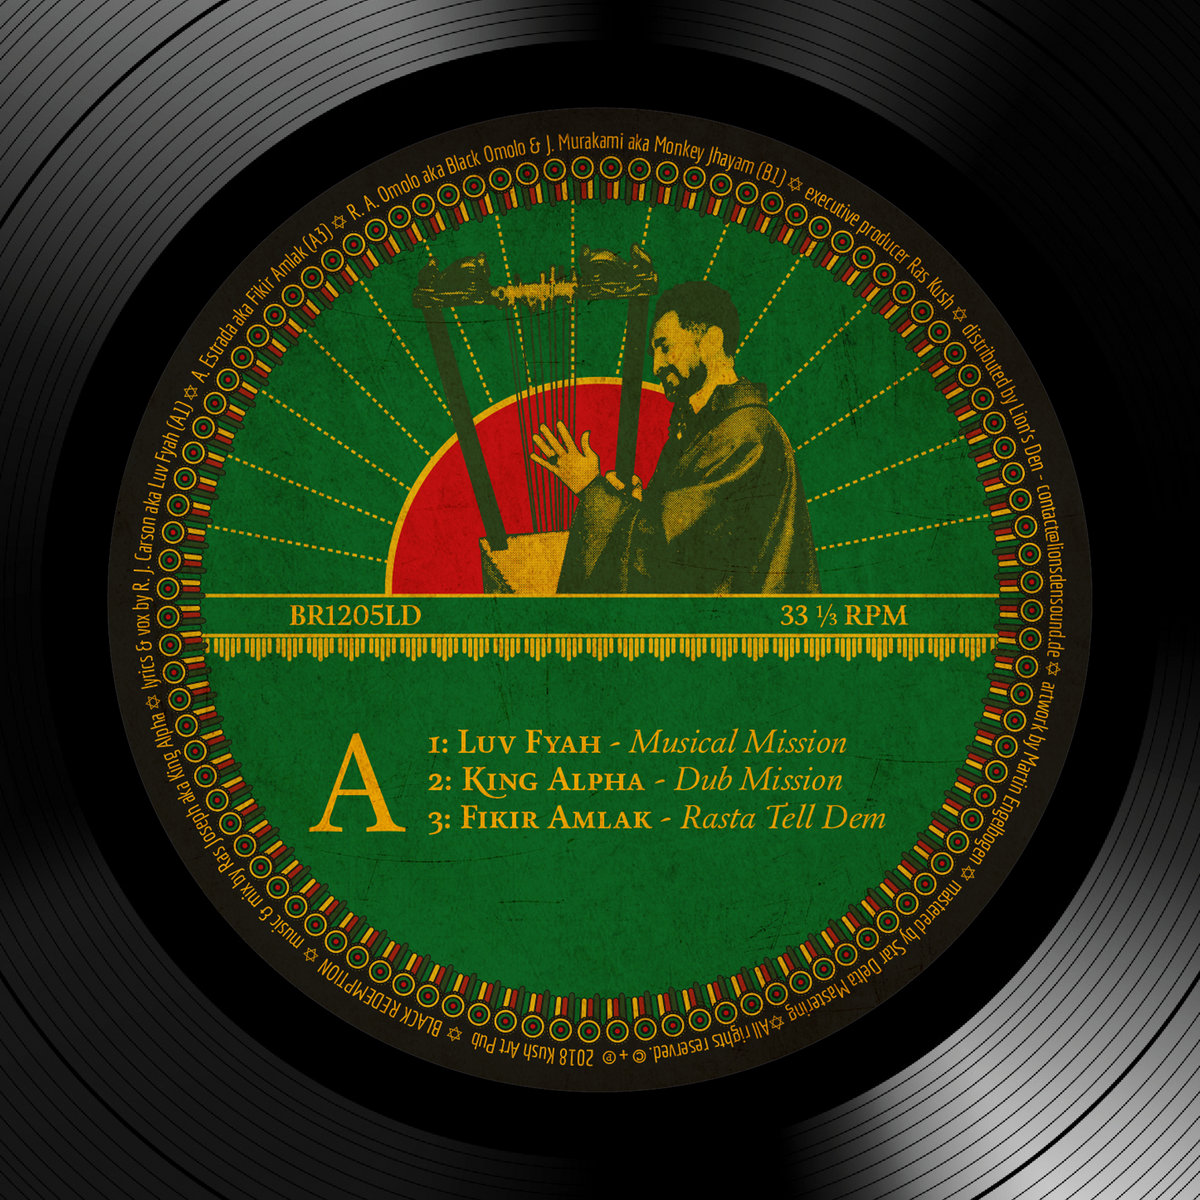 B3 - King Alpha - Rasta Dub Dem  3ac9e9506e5